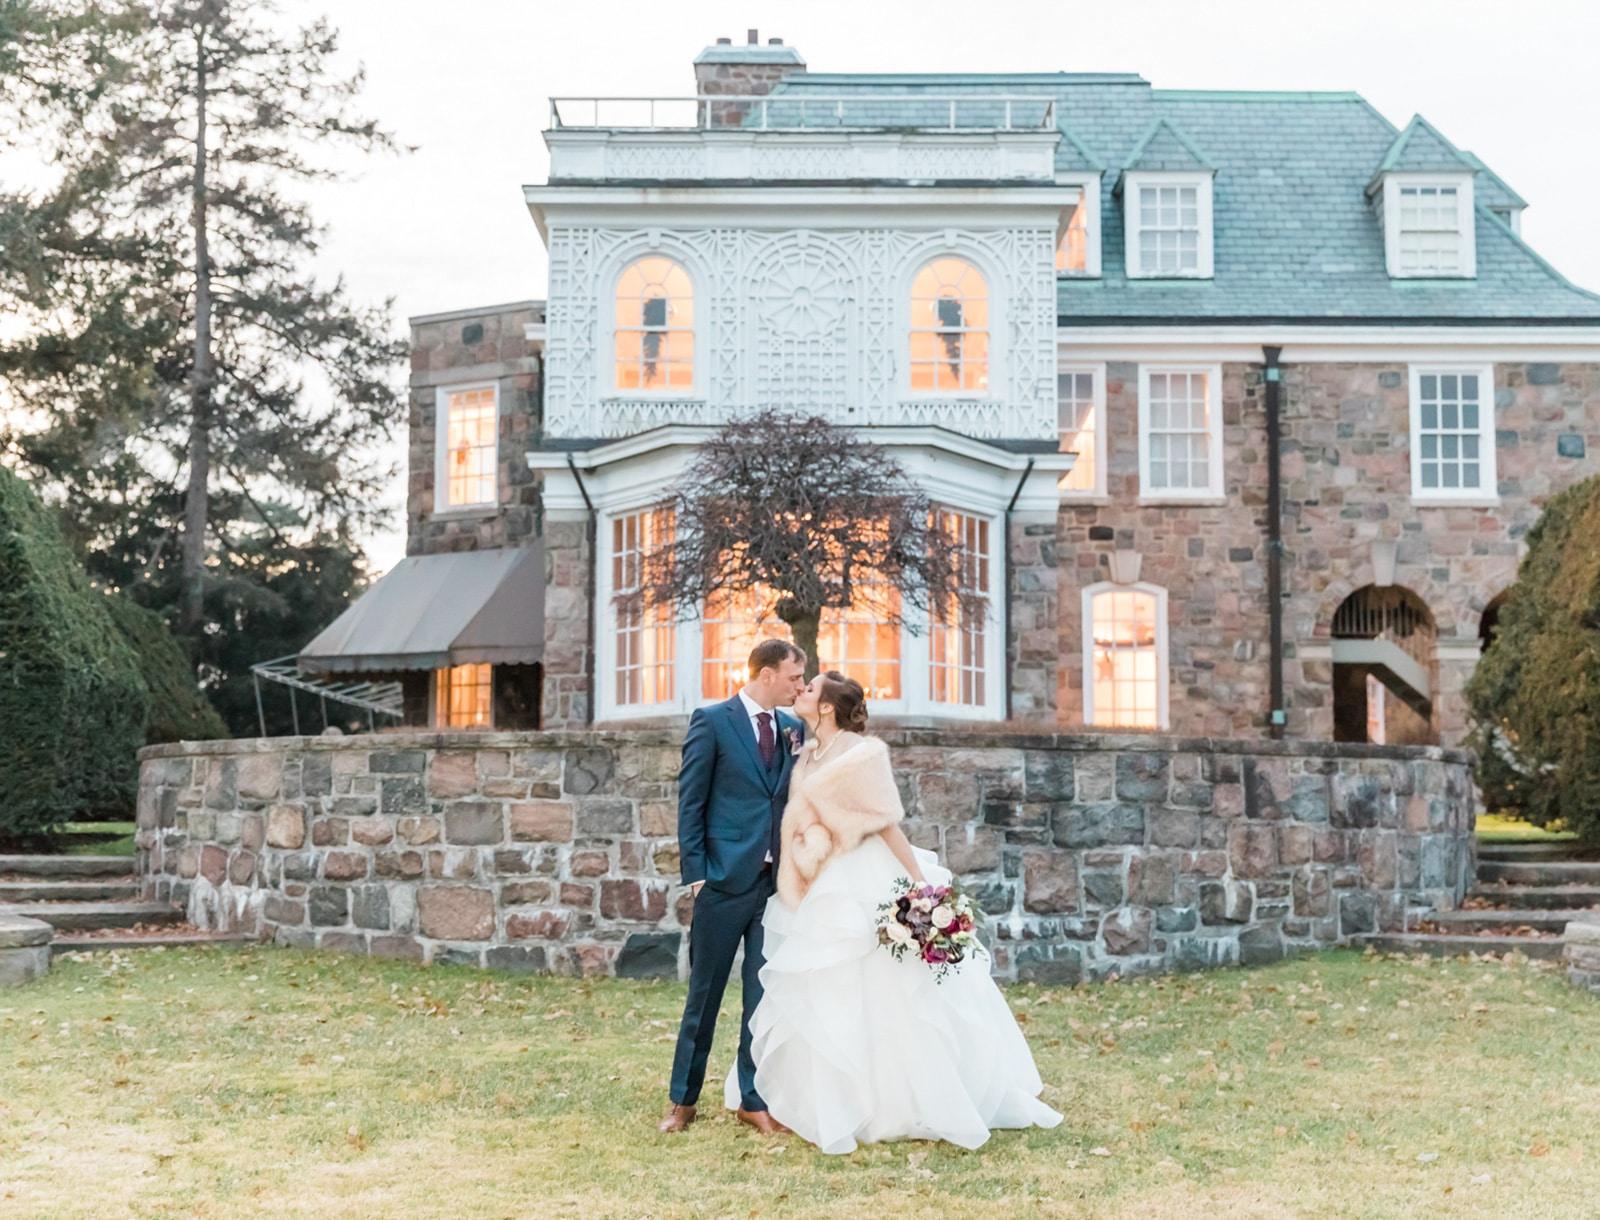 Estates of Sunnybrook Winter Wedding: Crystal + Michael